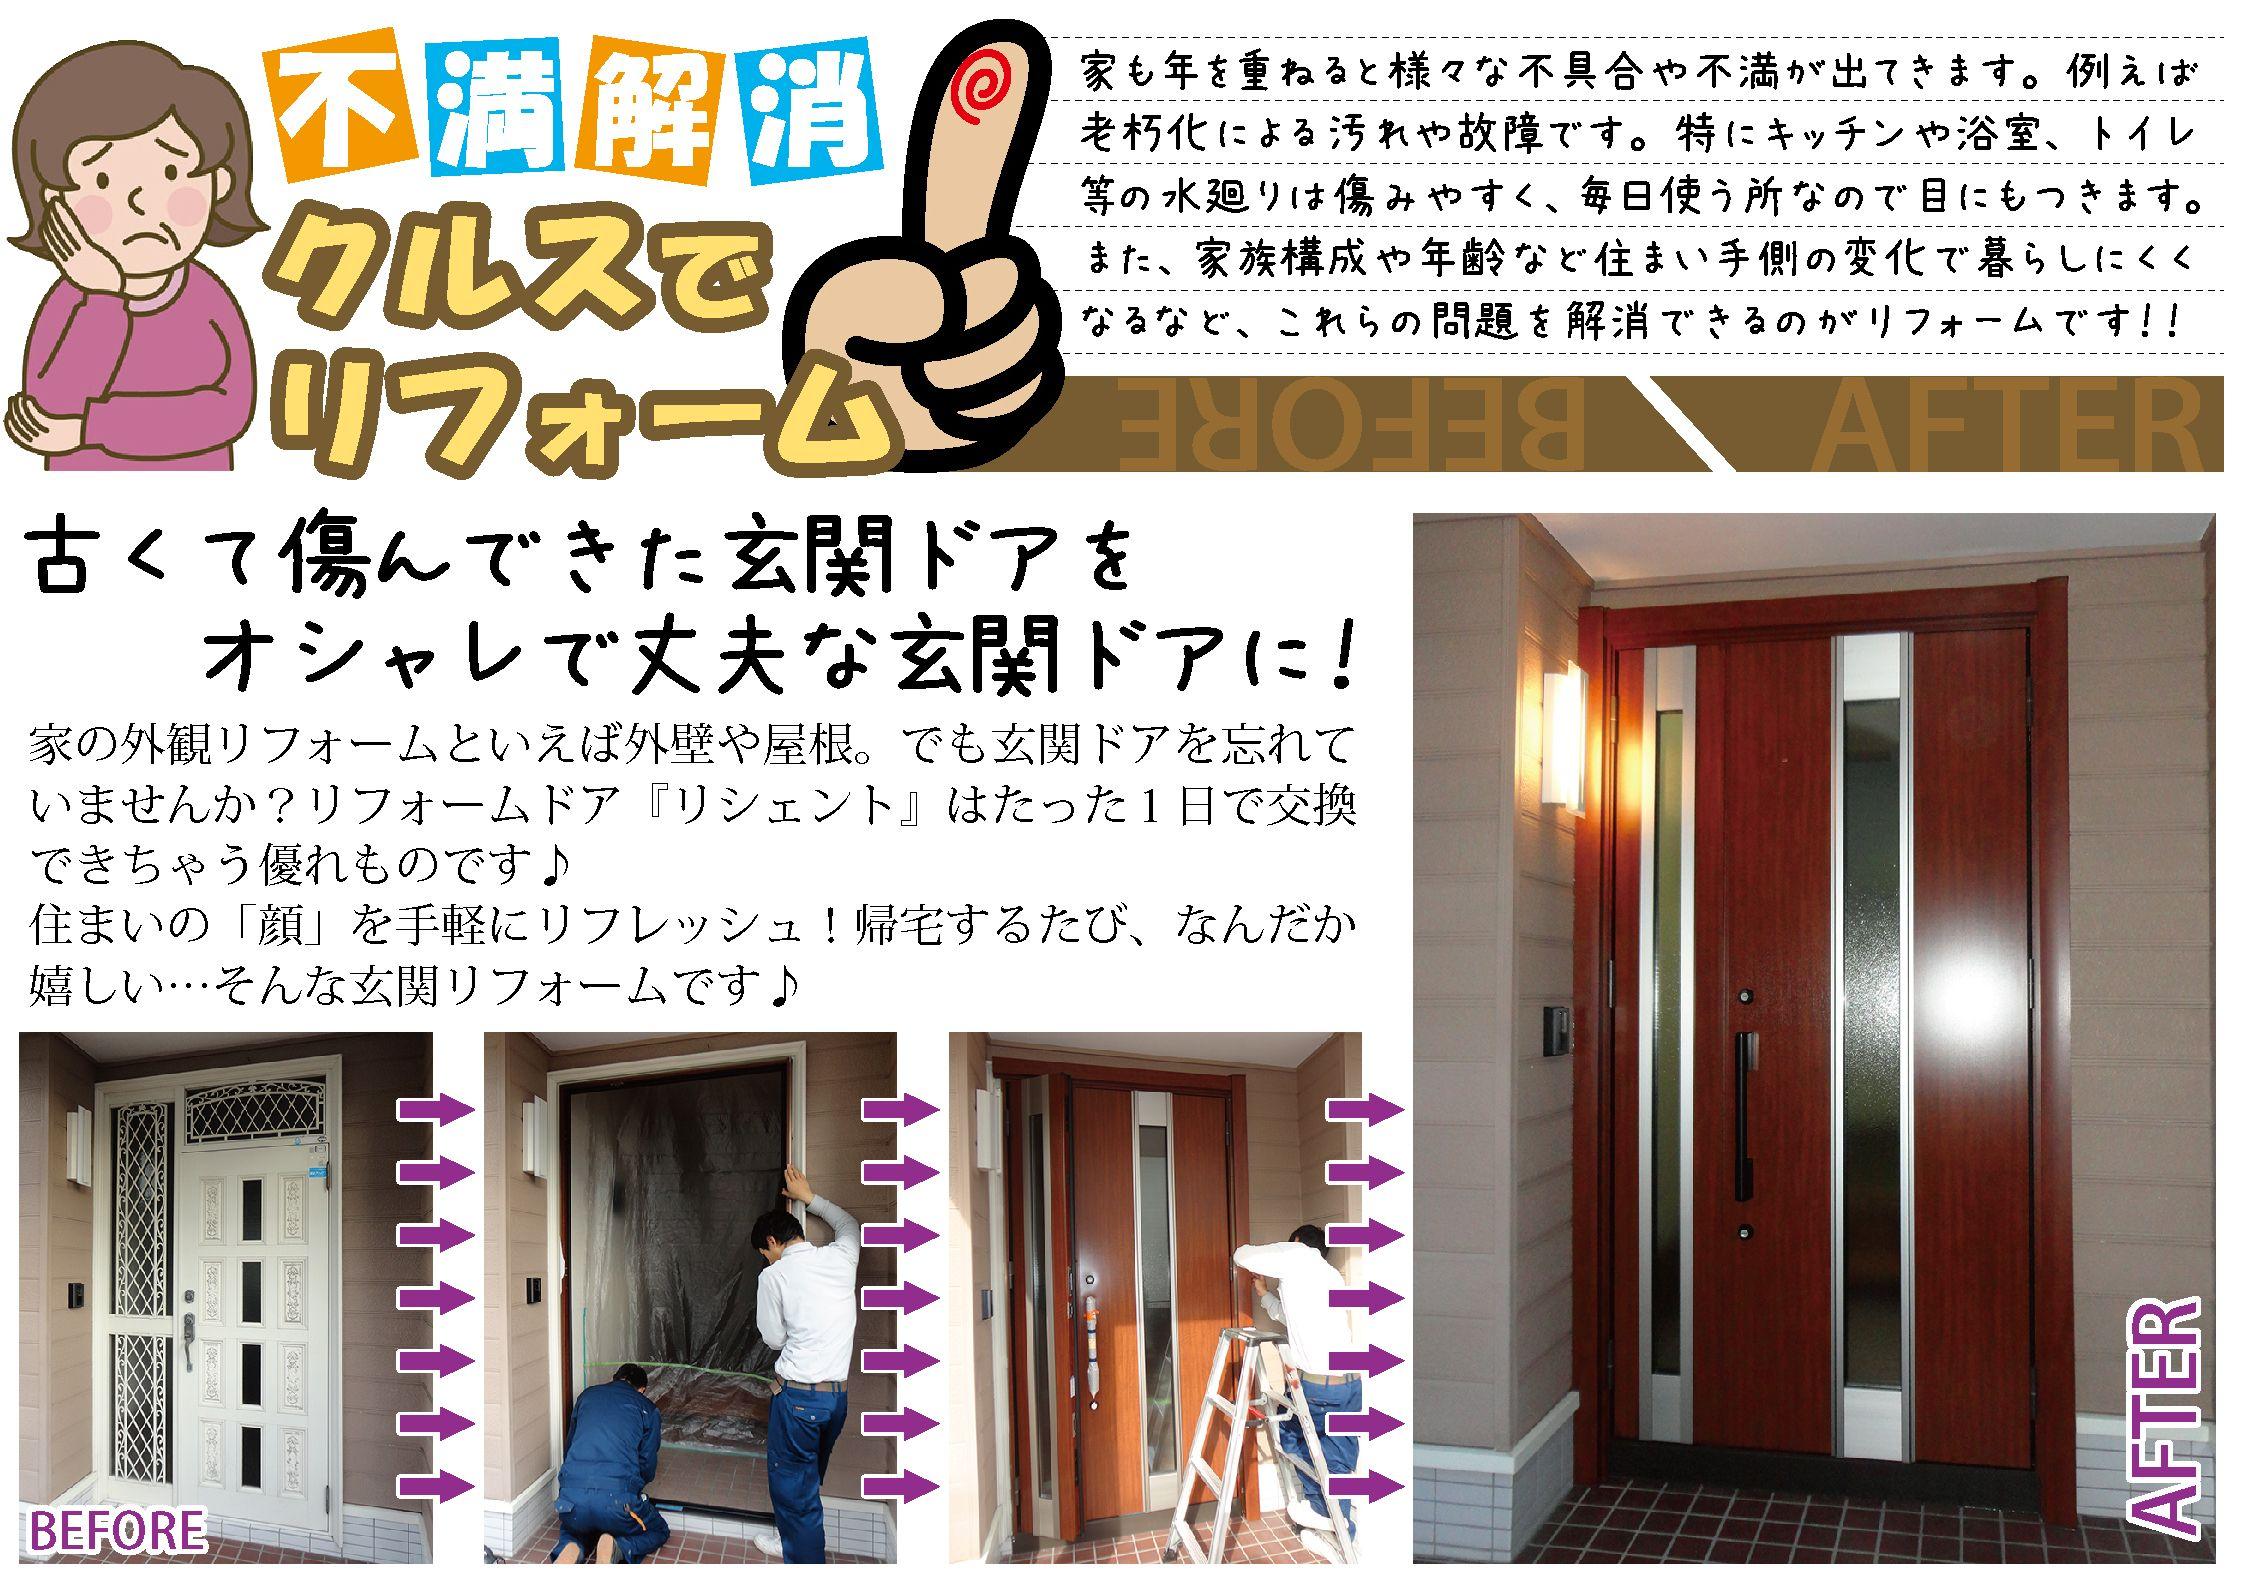 KuraSi-natu-sin98-04.jpg